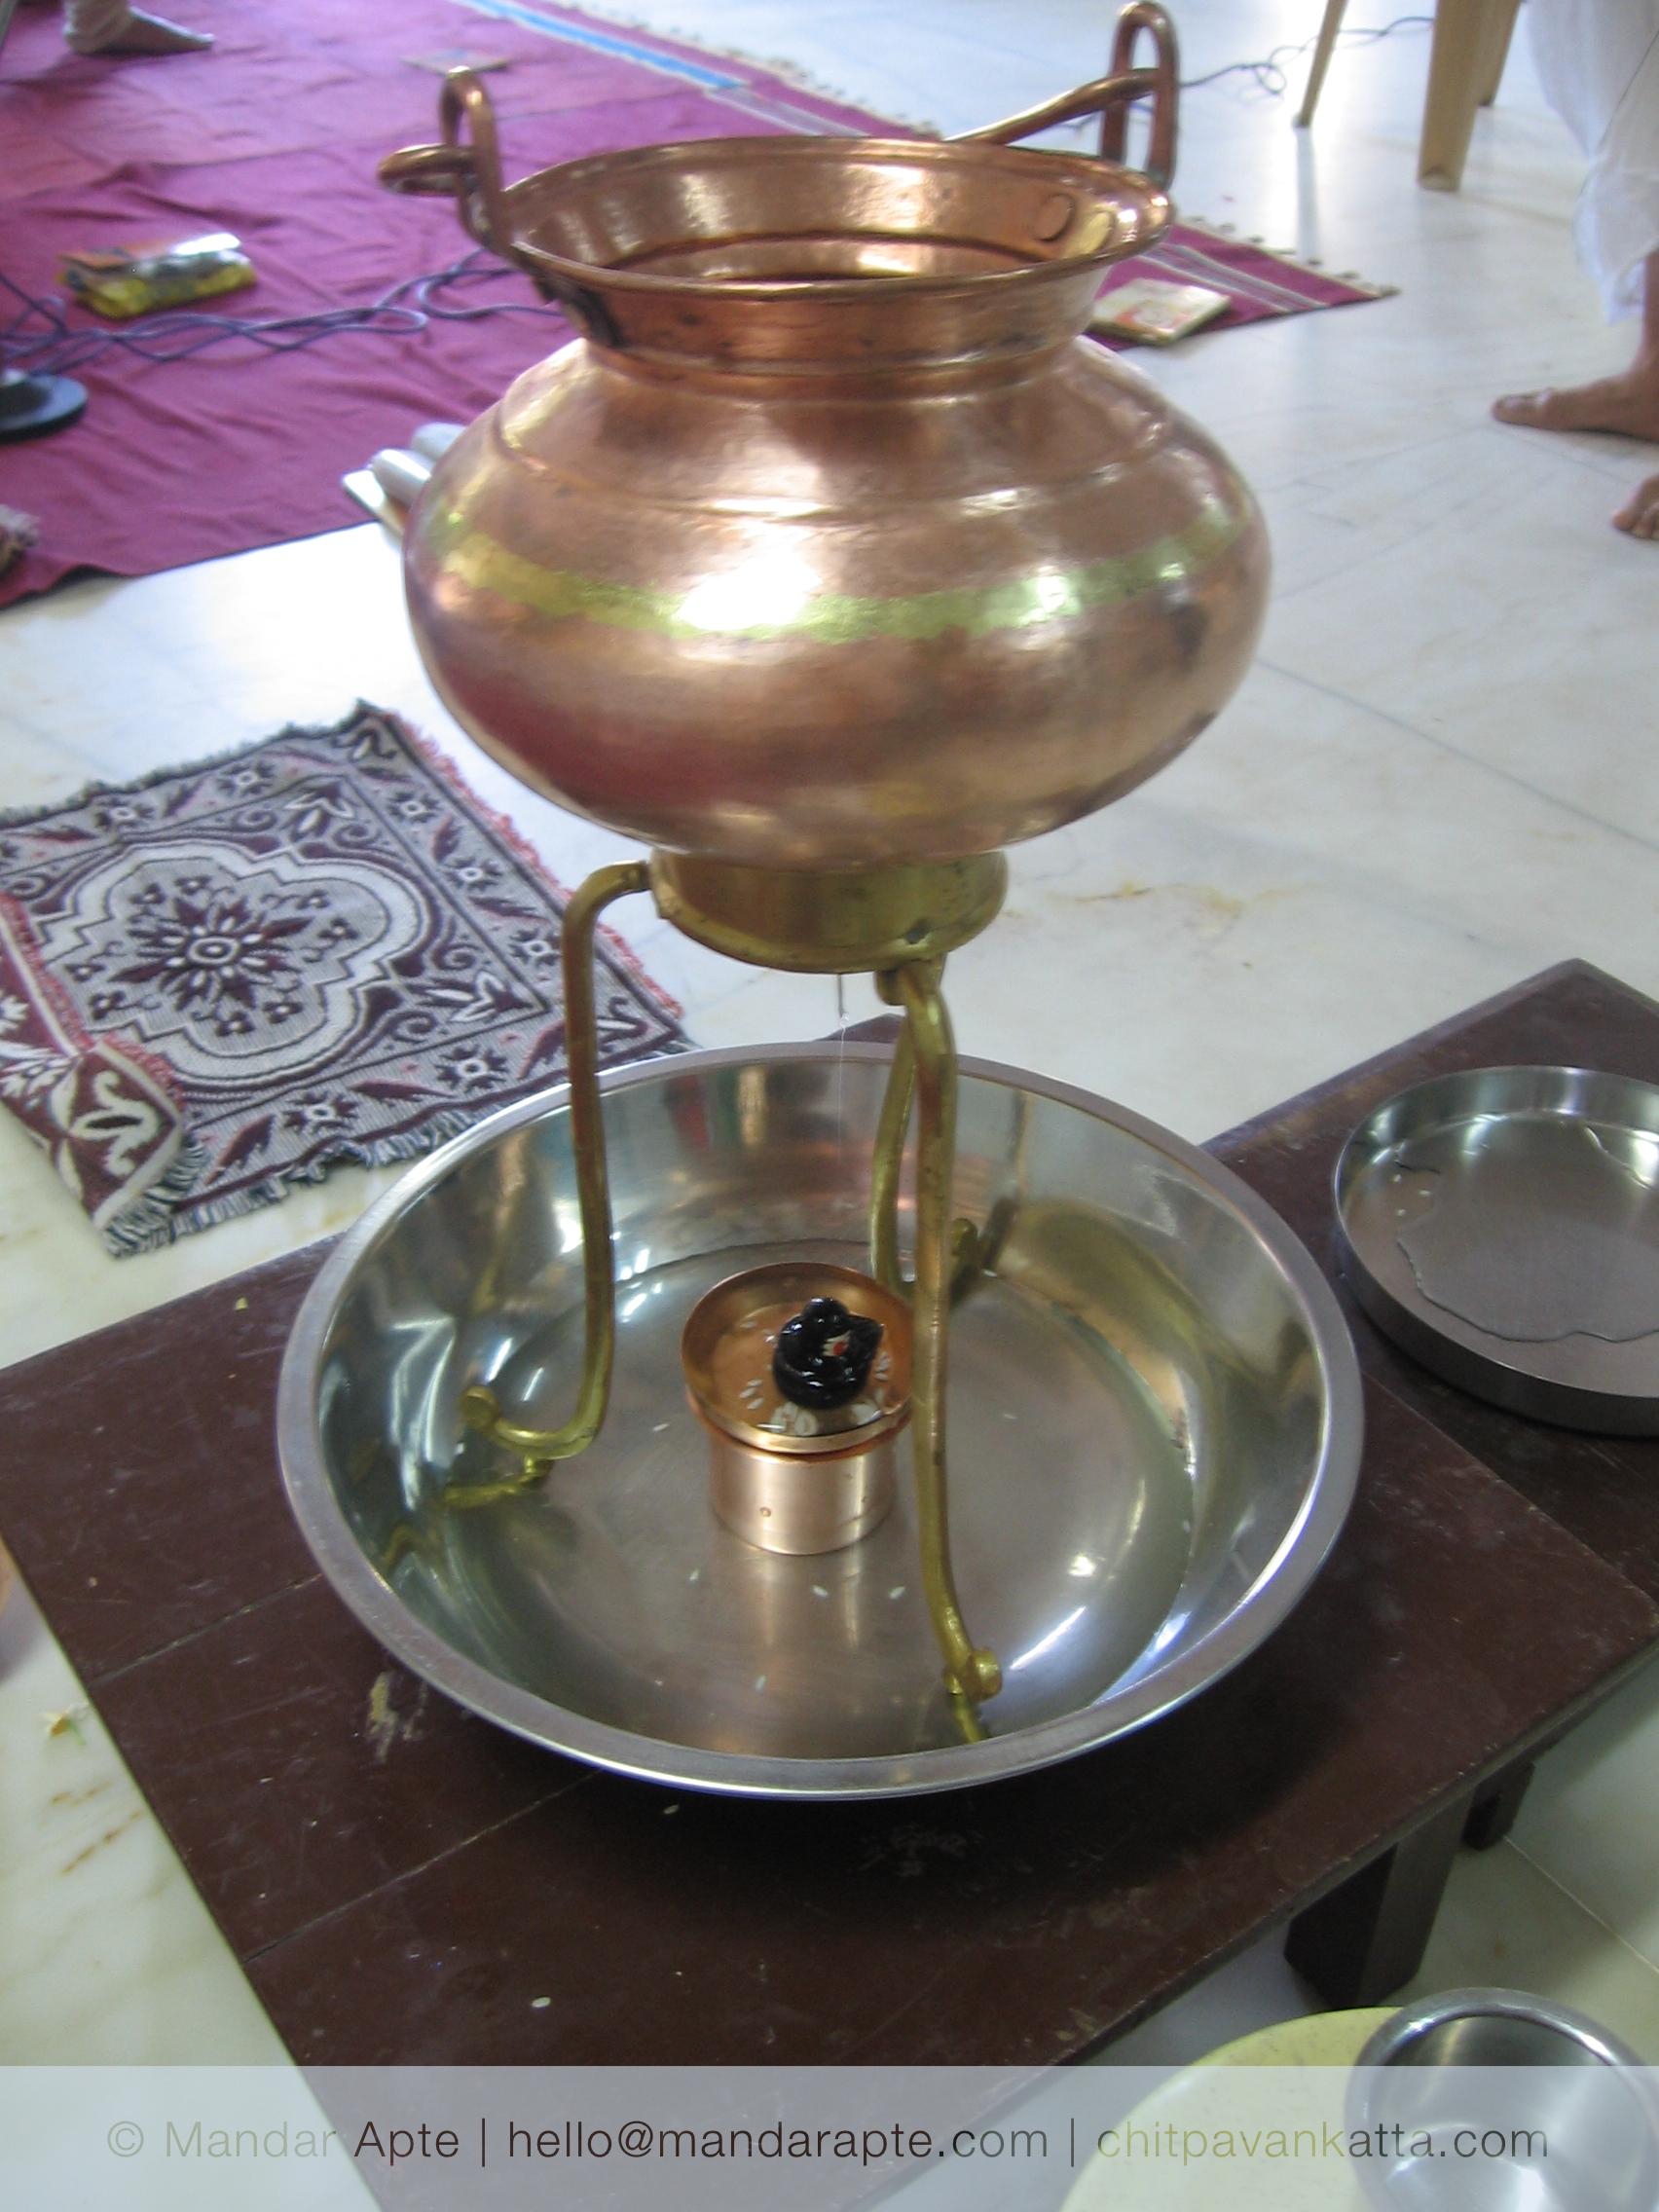 Mahashivaratri at Chitpavan Sangha Mulund 10th March 2013 02